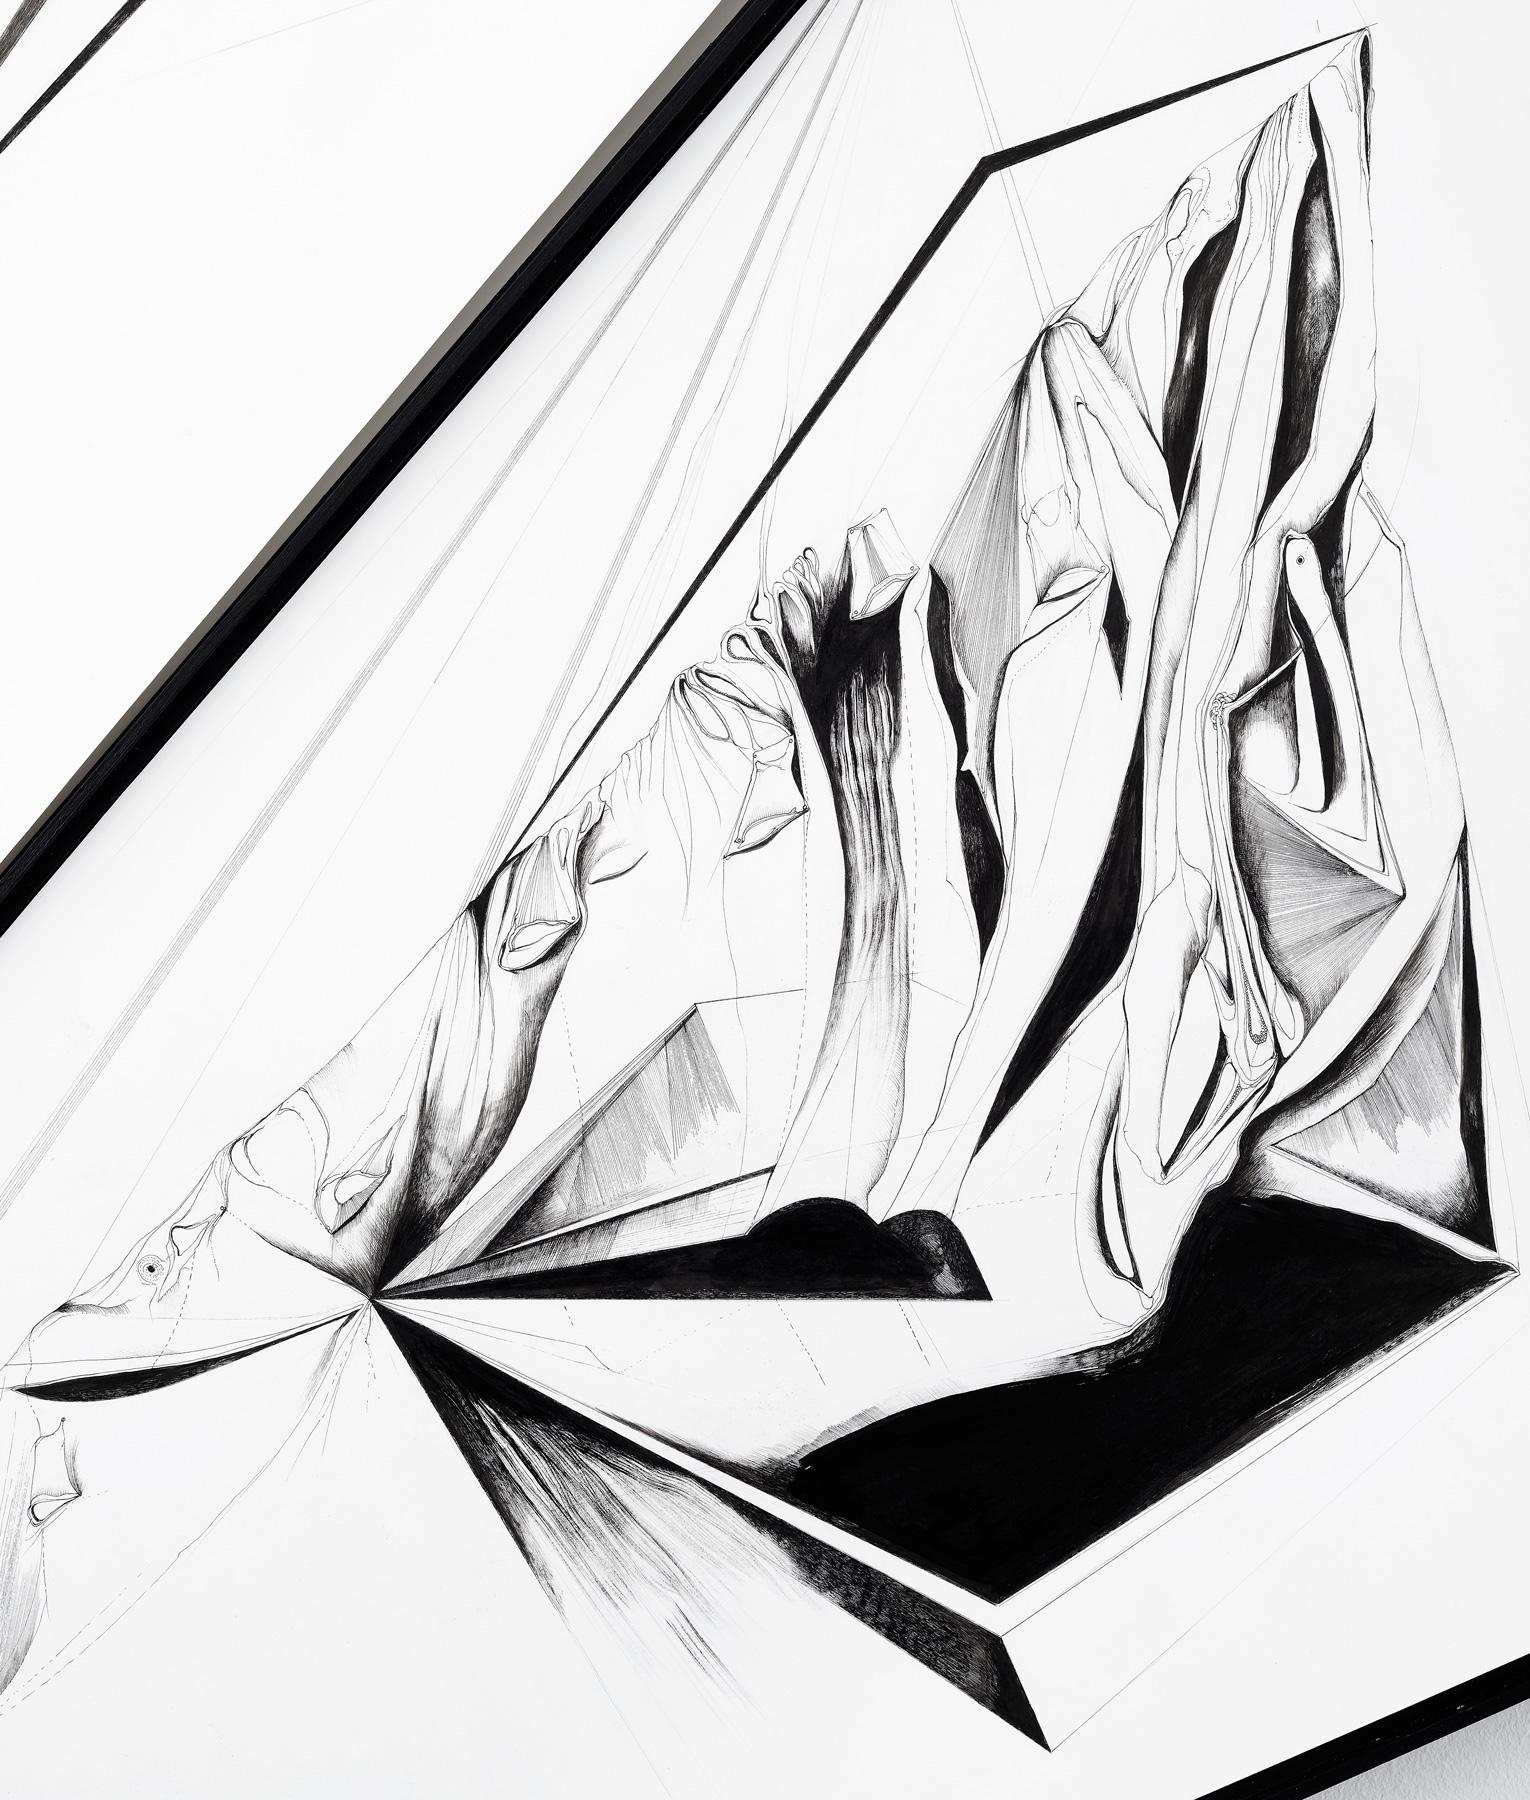 Nina Annabelle Märkl | Scapes 7 | 140 x 120 cm | Ink on folded paper, Cutouts, wood | 2016